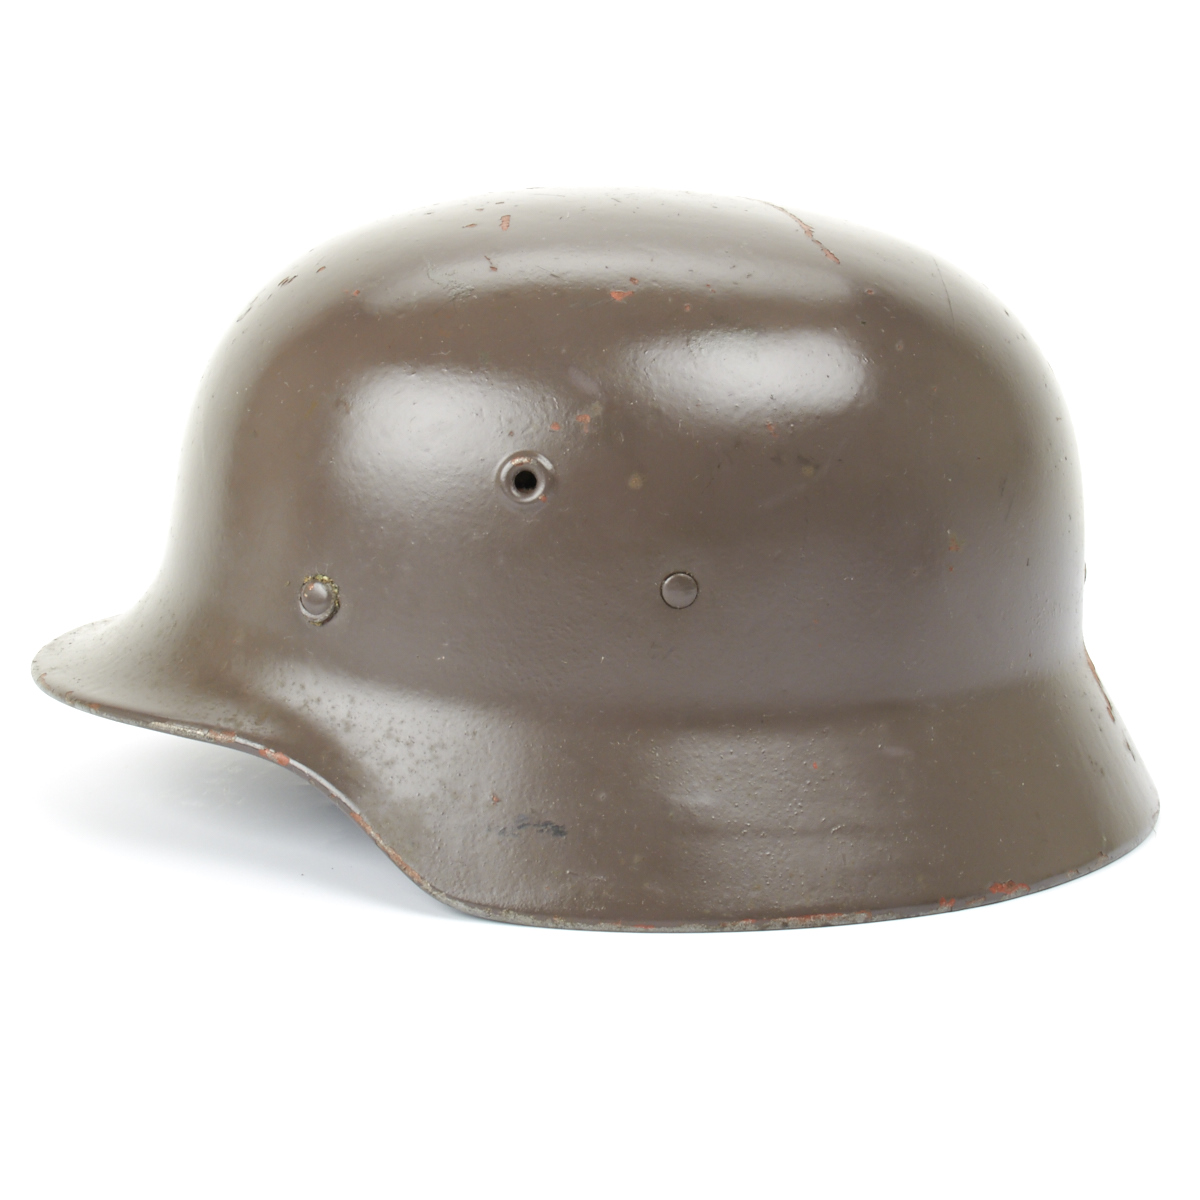 Original German WWII M40 Stahlhelm Steel Helmet- Shell